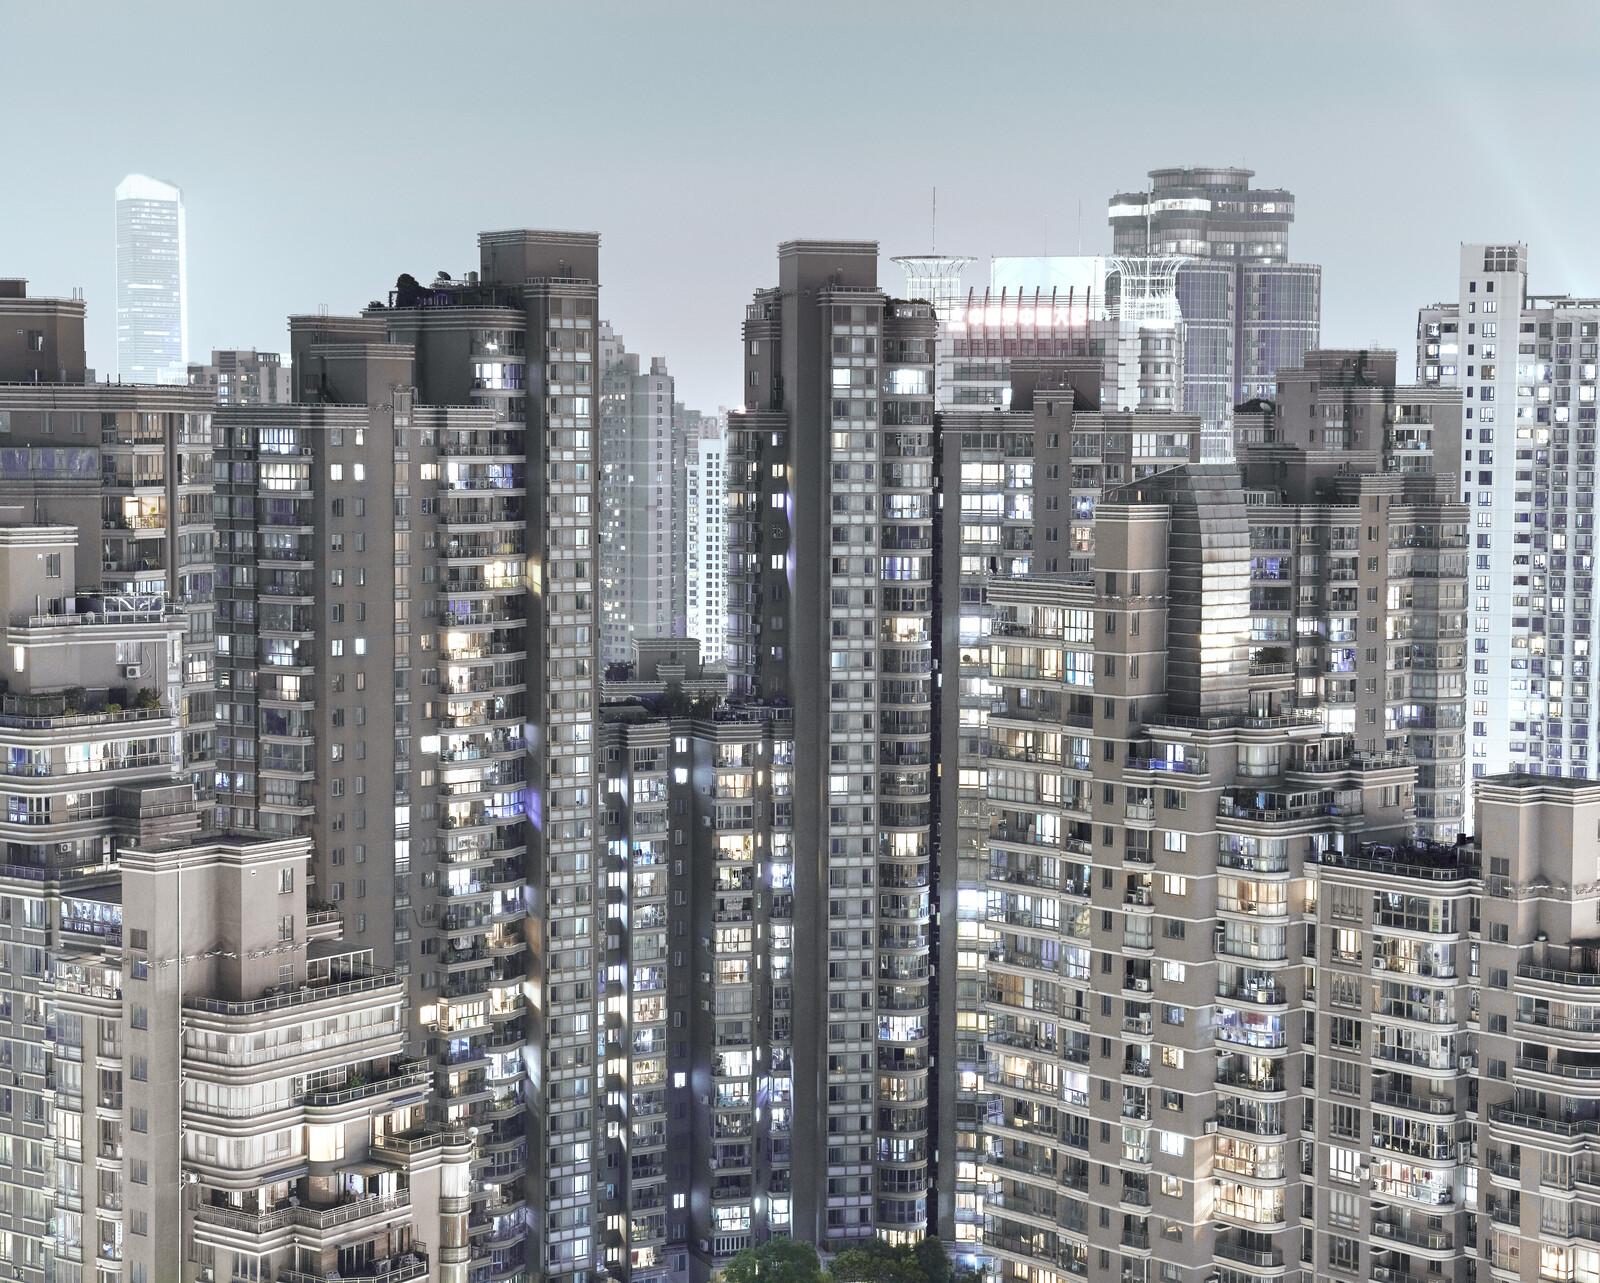 Urban landscape II - Bence Bakonyi